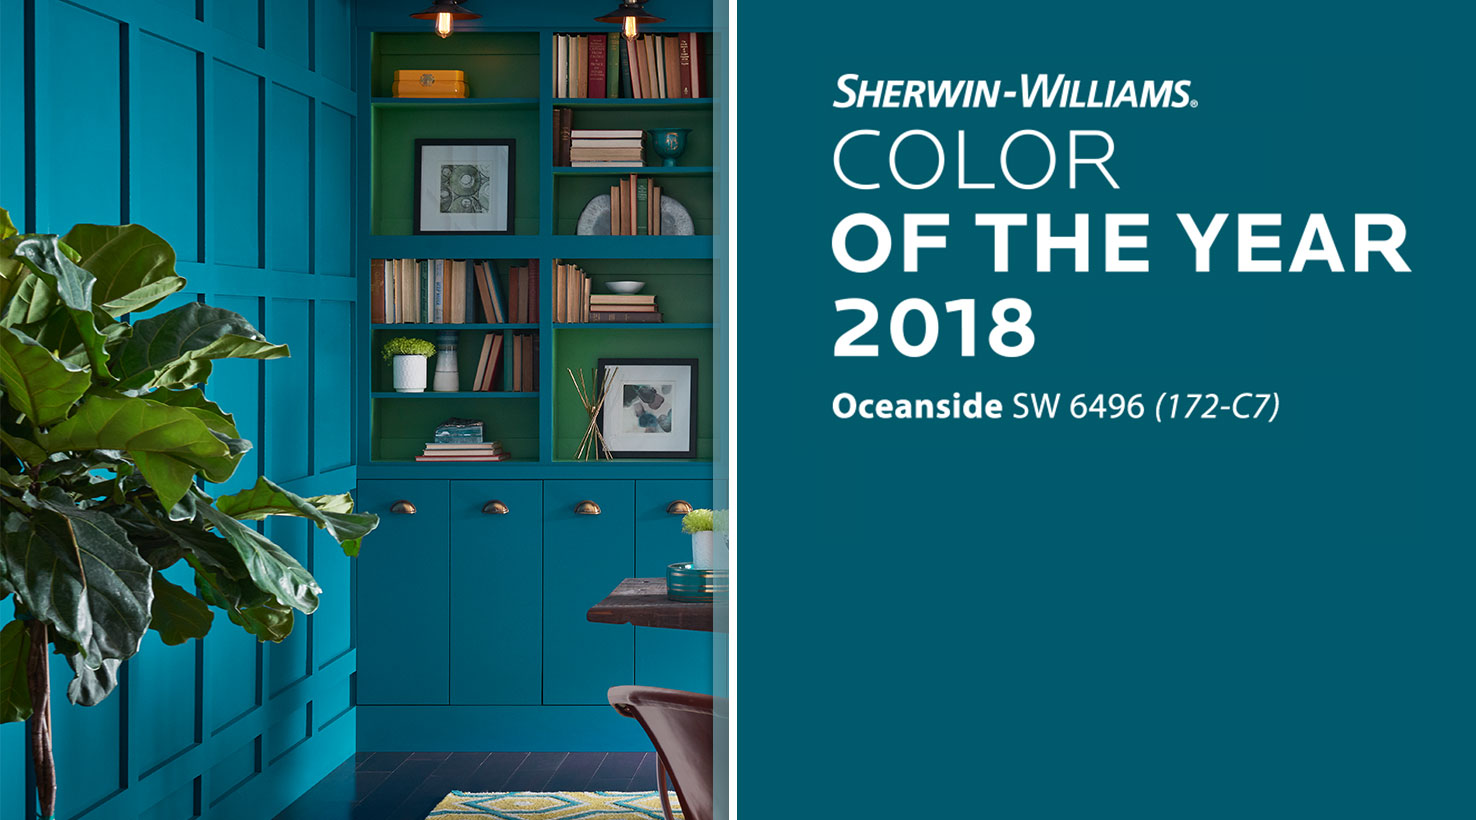 92 Sherwin Williams Smokey Blue Bedroom Style Gorgeous